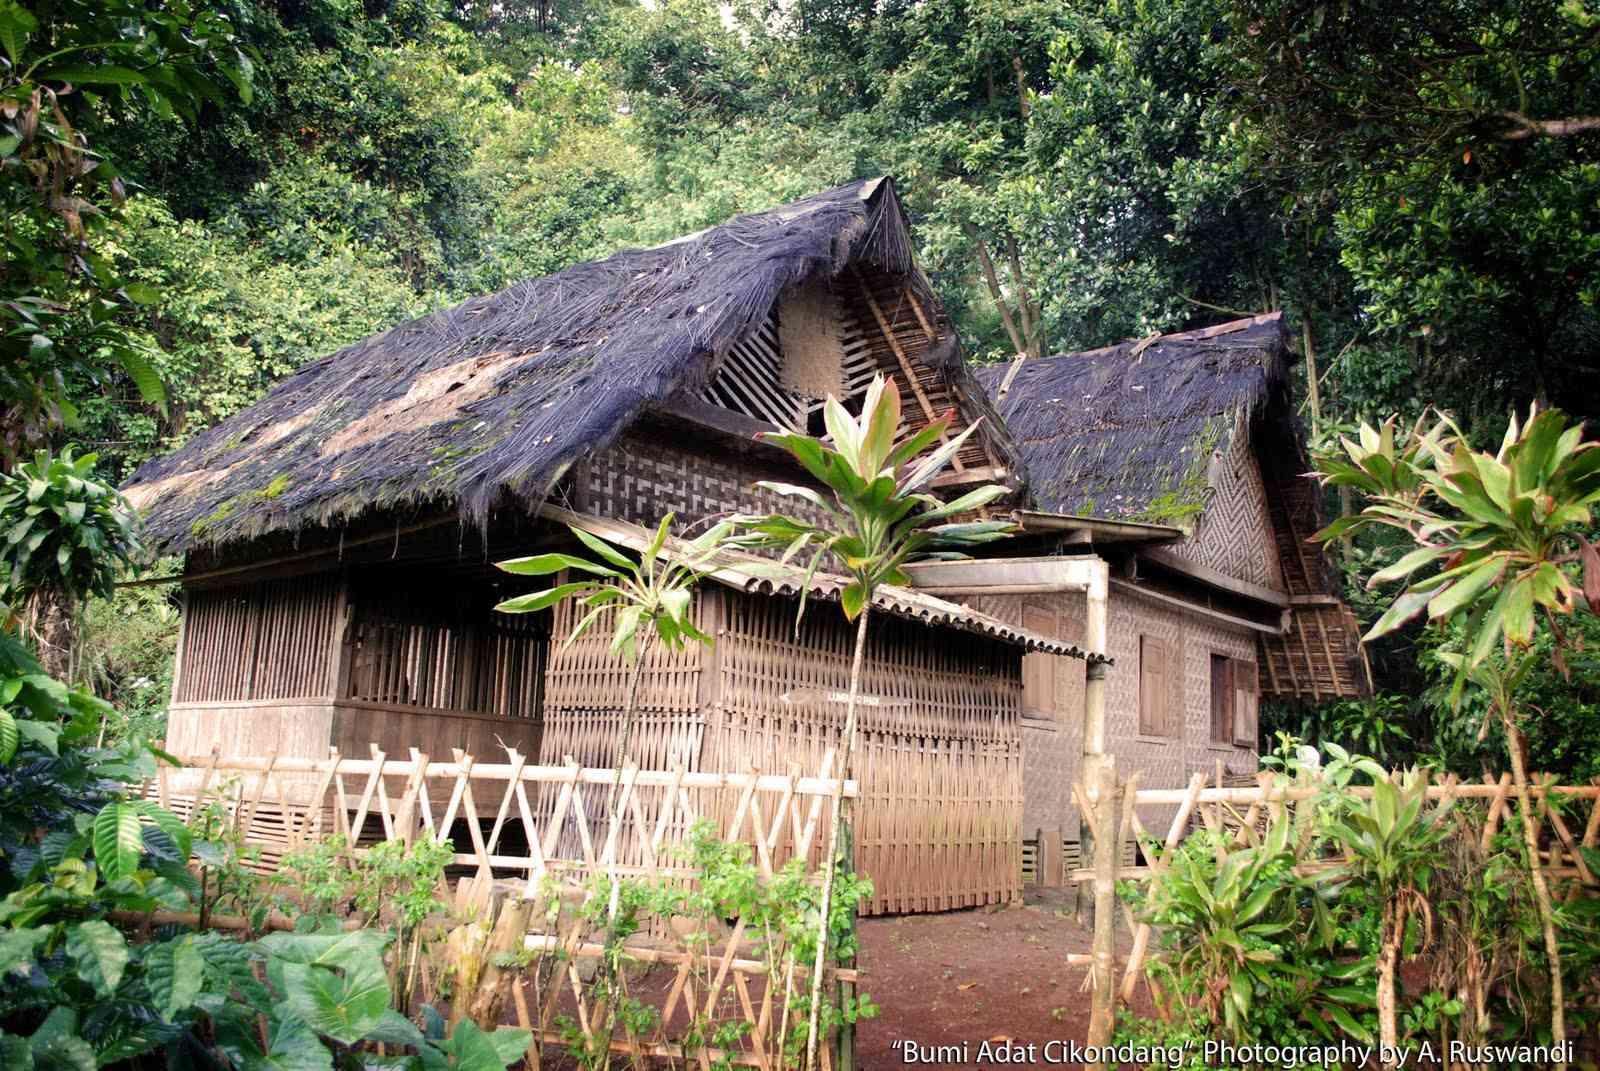 Hasil gambar untuk rumah adat cikondang desa lamajang